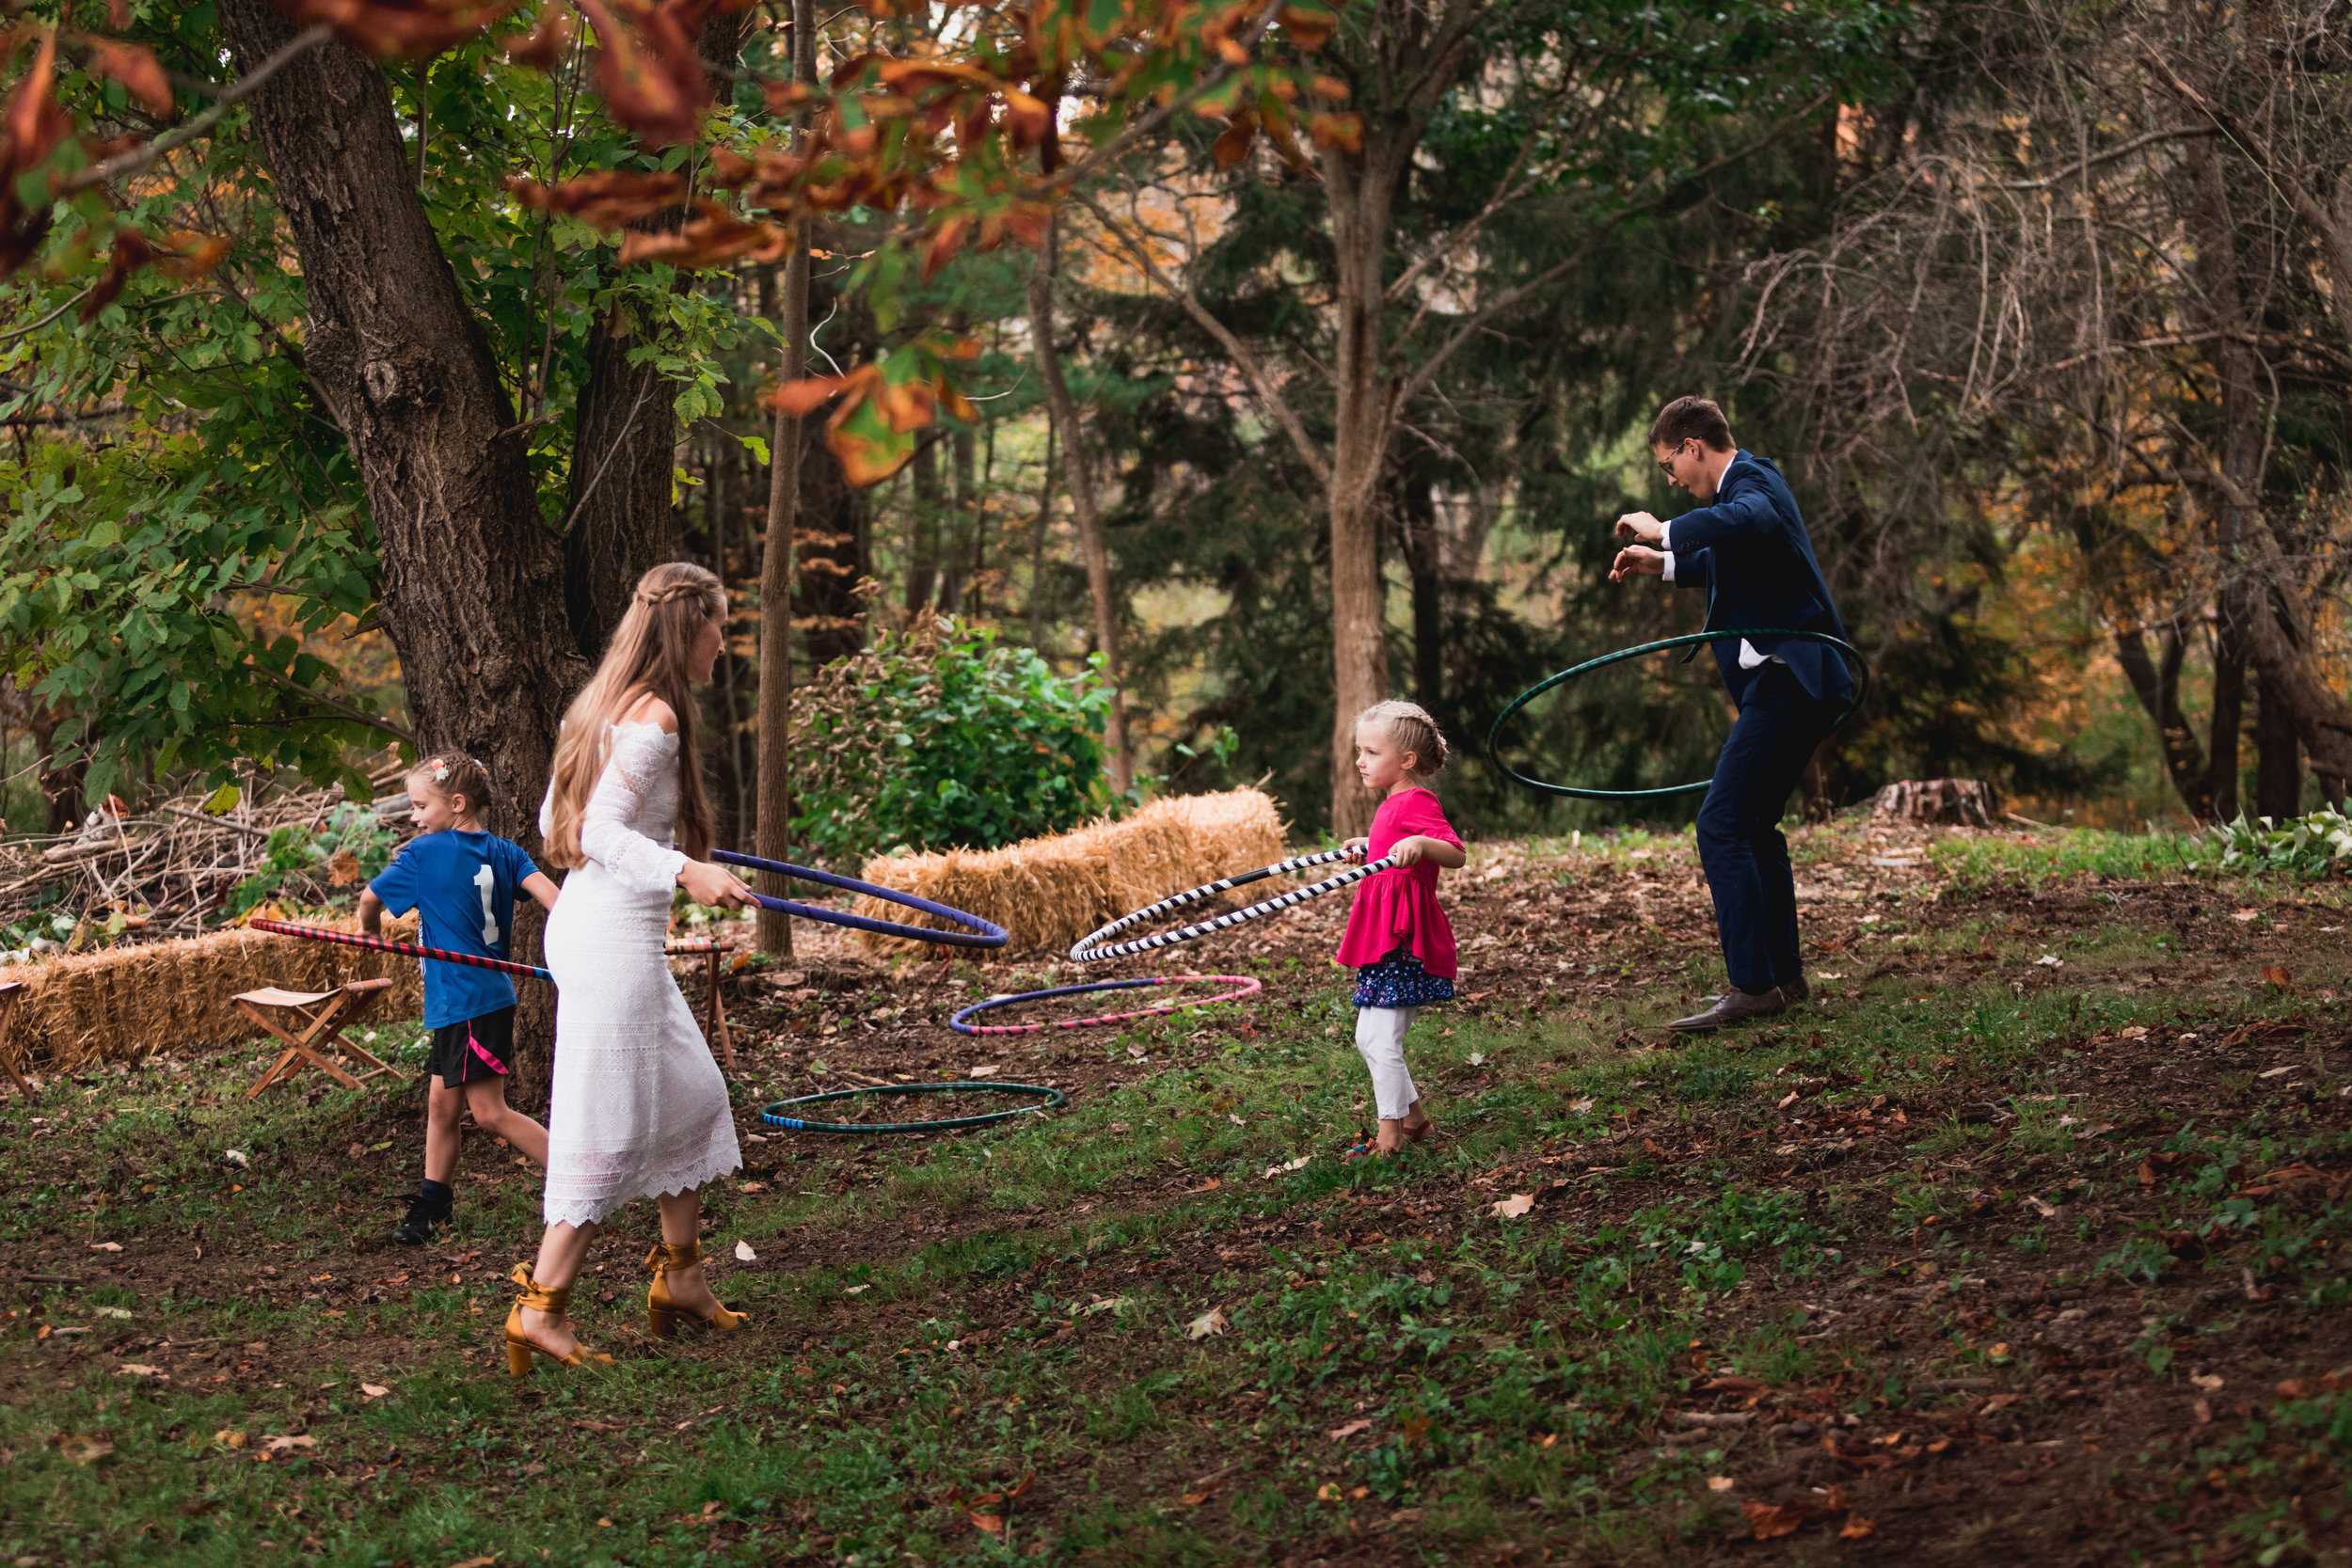 vild-photography-photographer-tahoe-intimate-wedding-adventure-van-abigail-102.jpg